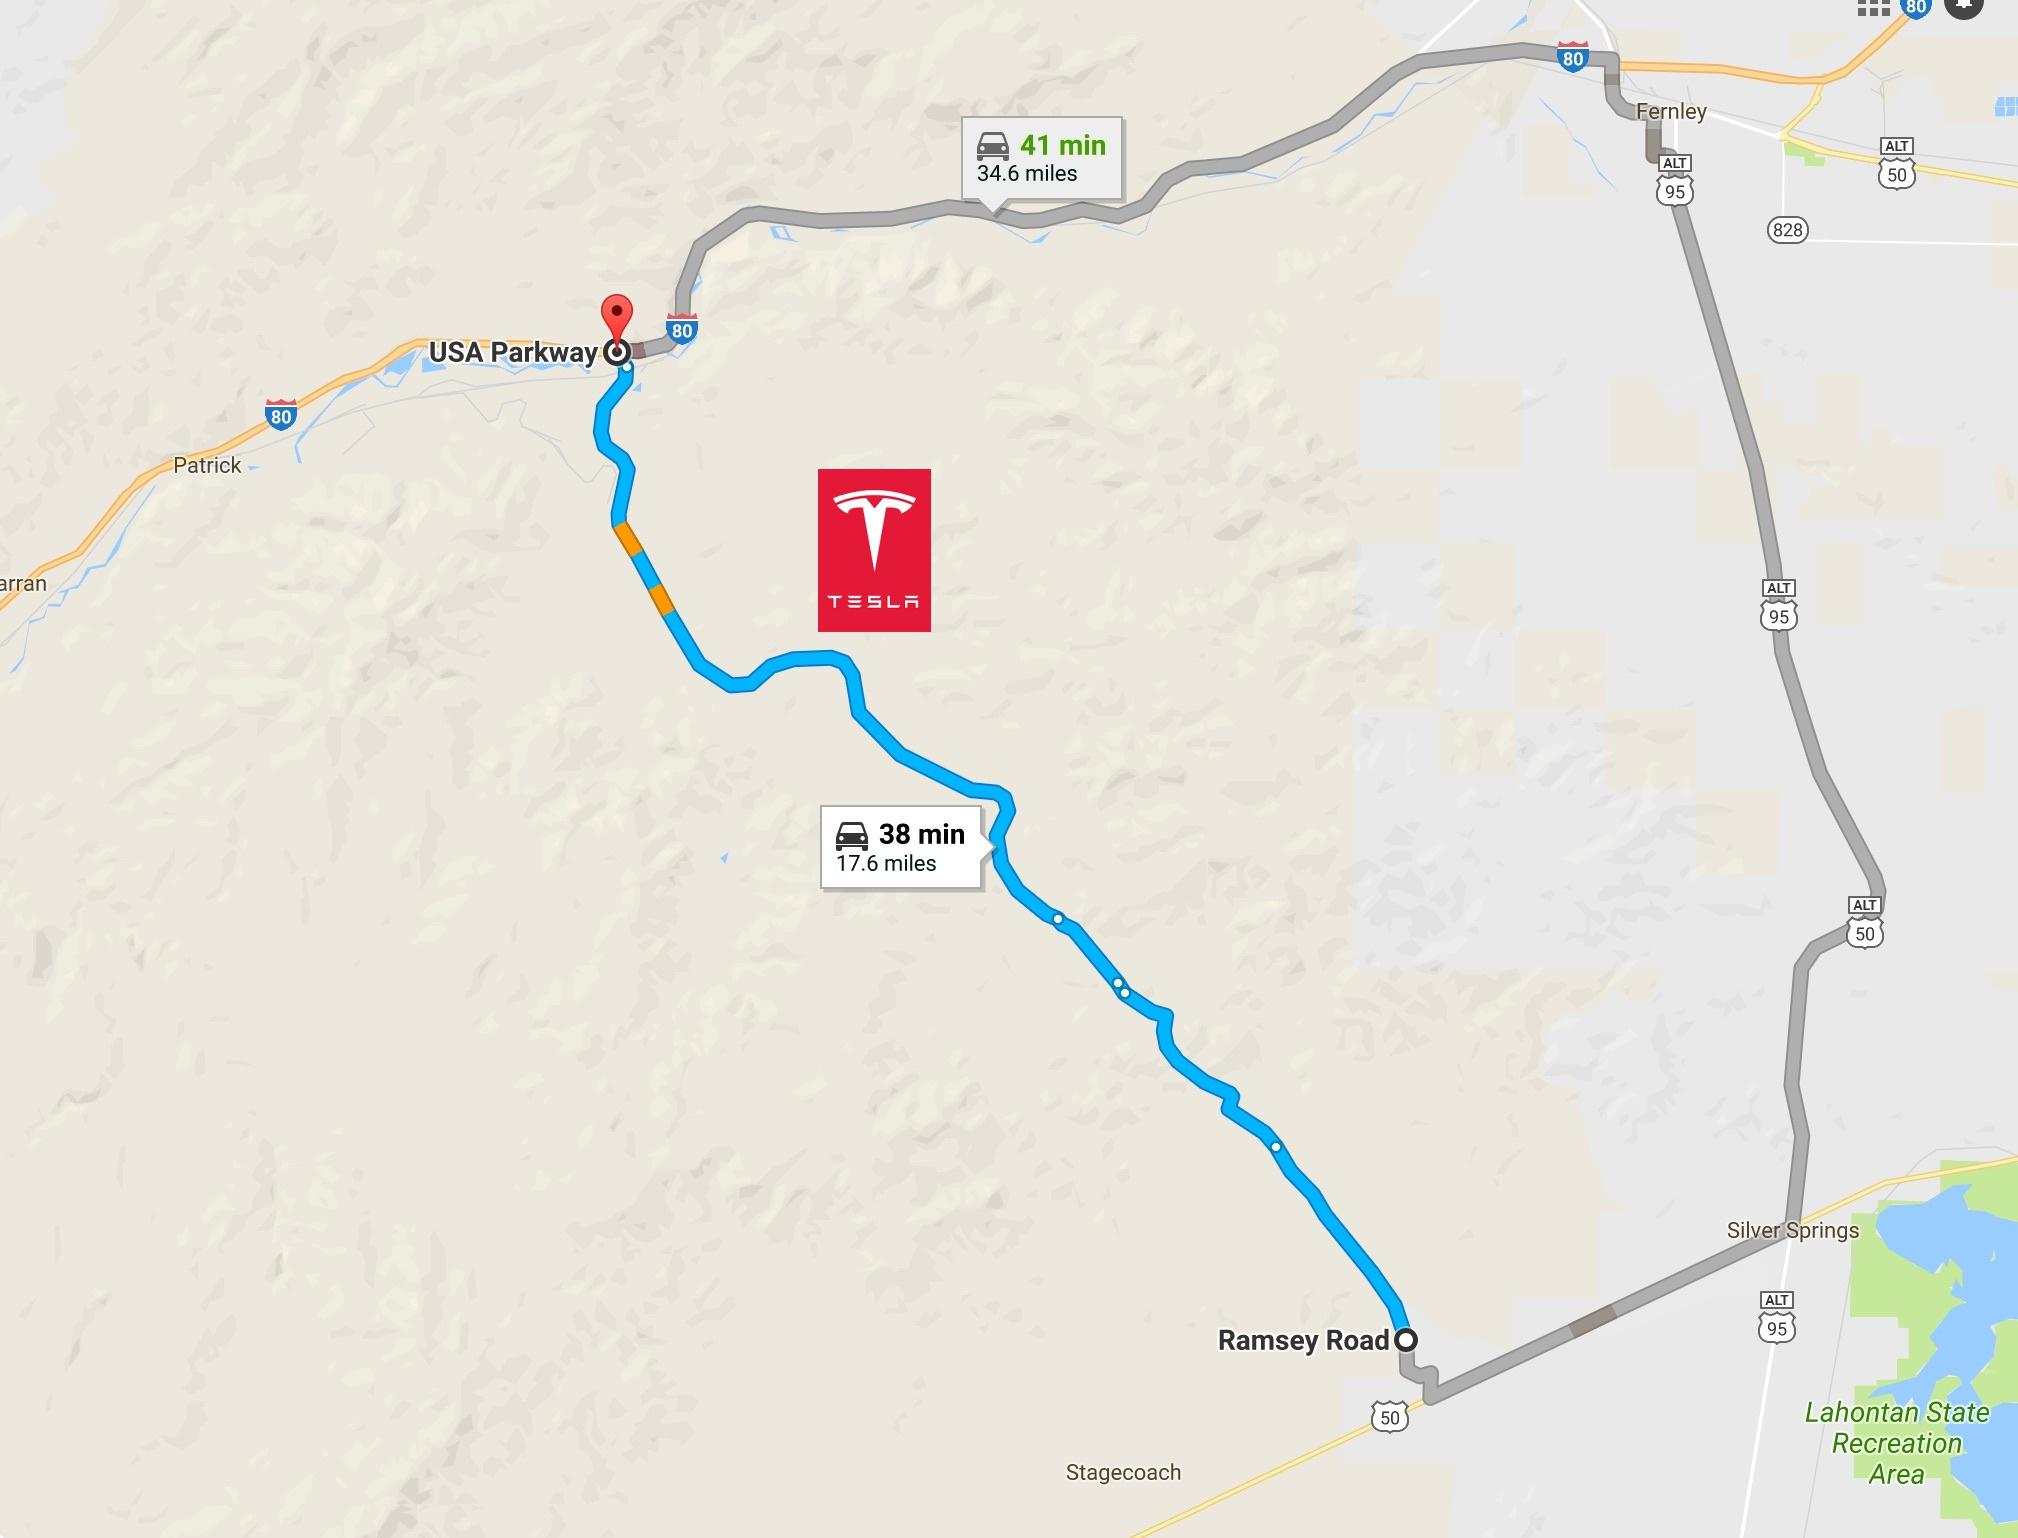 tesla-gigafactory-usa-parkway-map